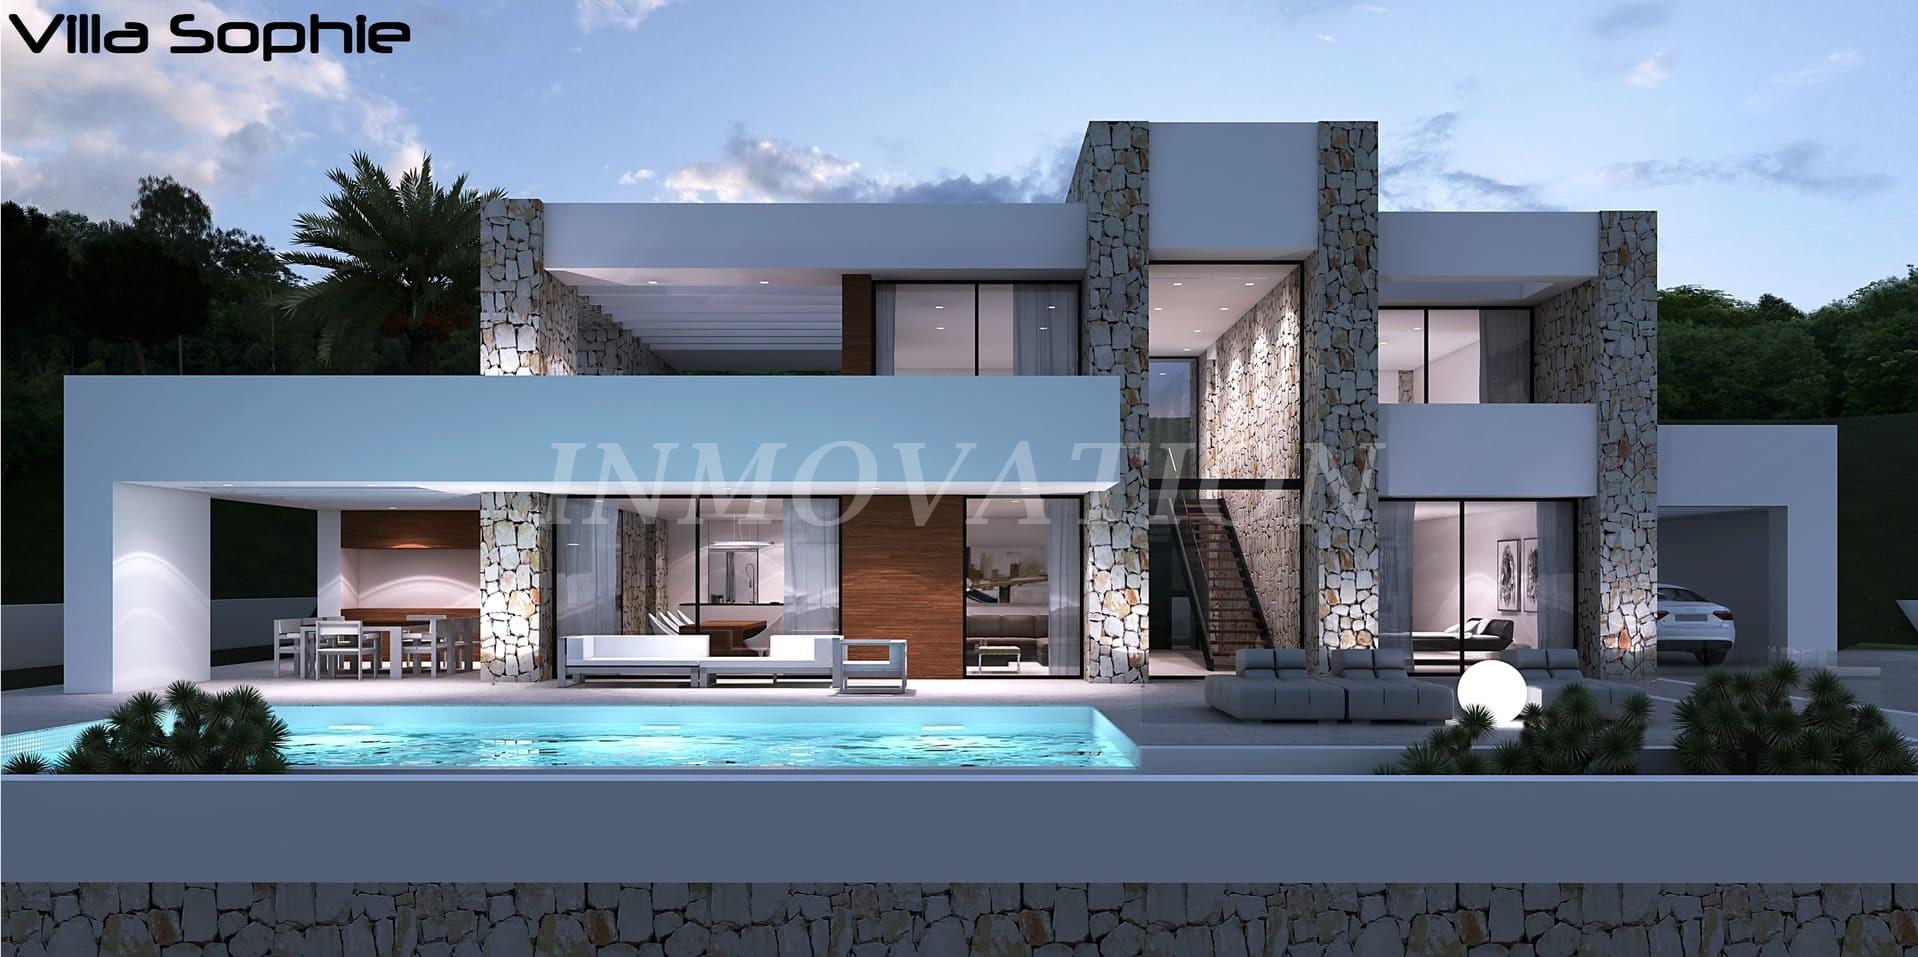 Top-Quality New Villa Project for Denia